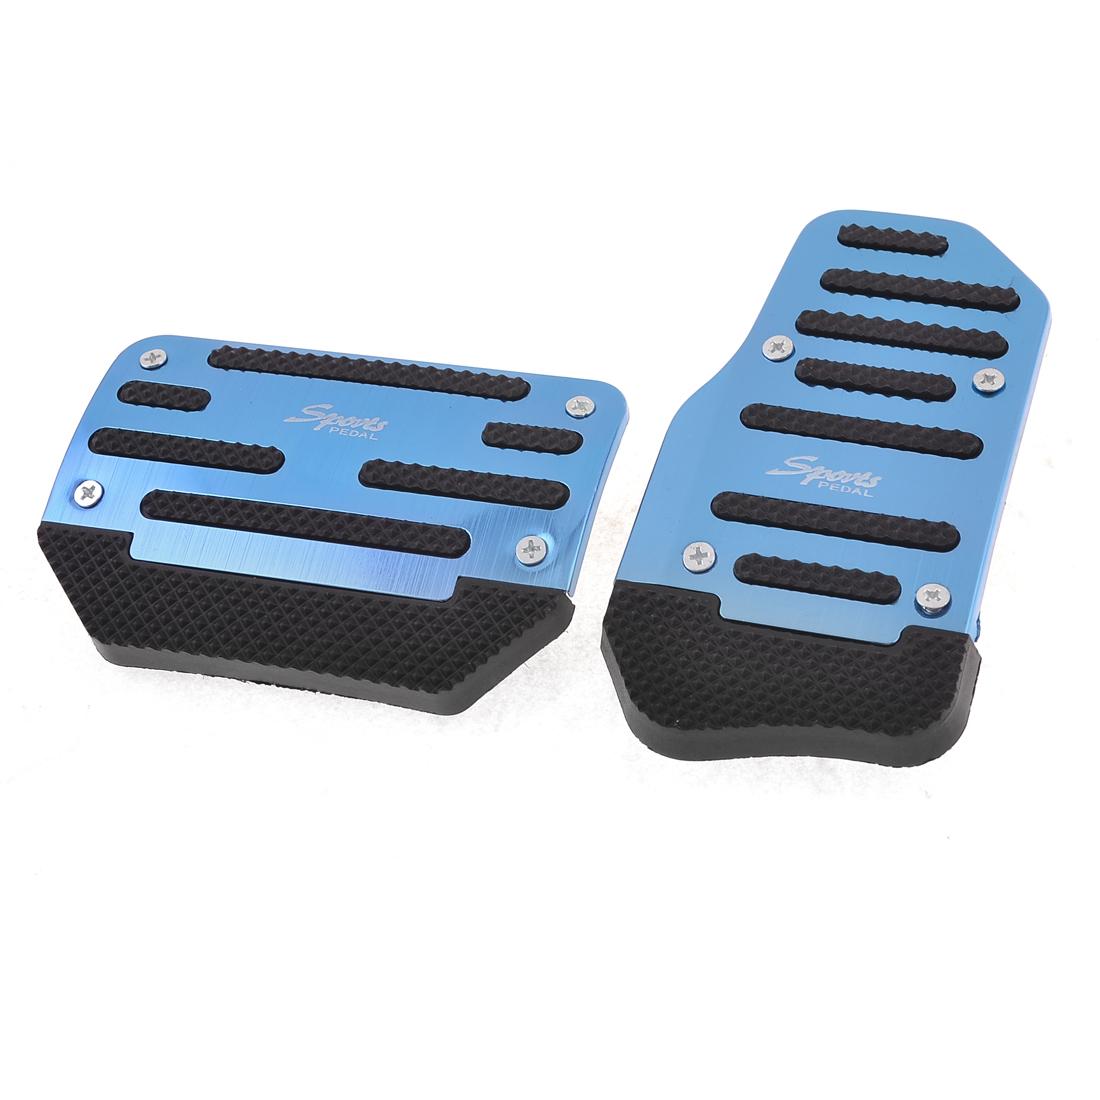 2PCS Blue Black Antislip Car Truck Automatic AT Gas Brake Pedal Covers